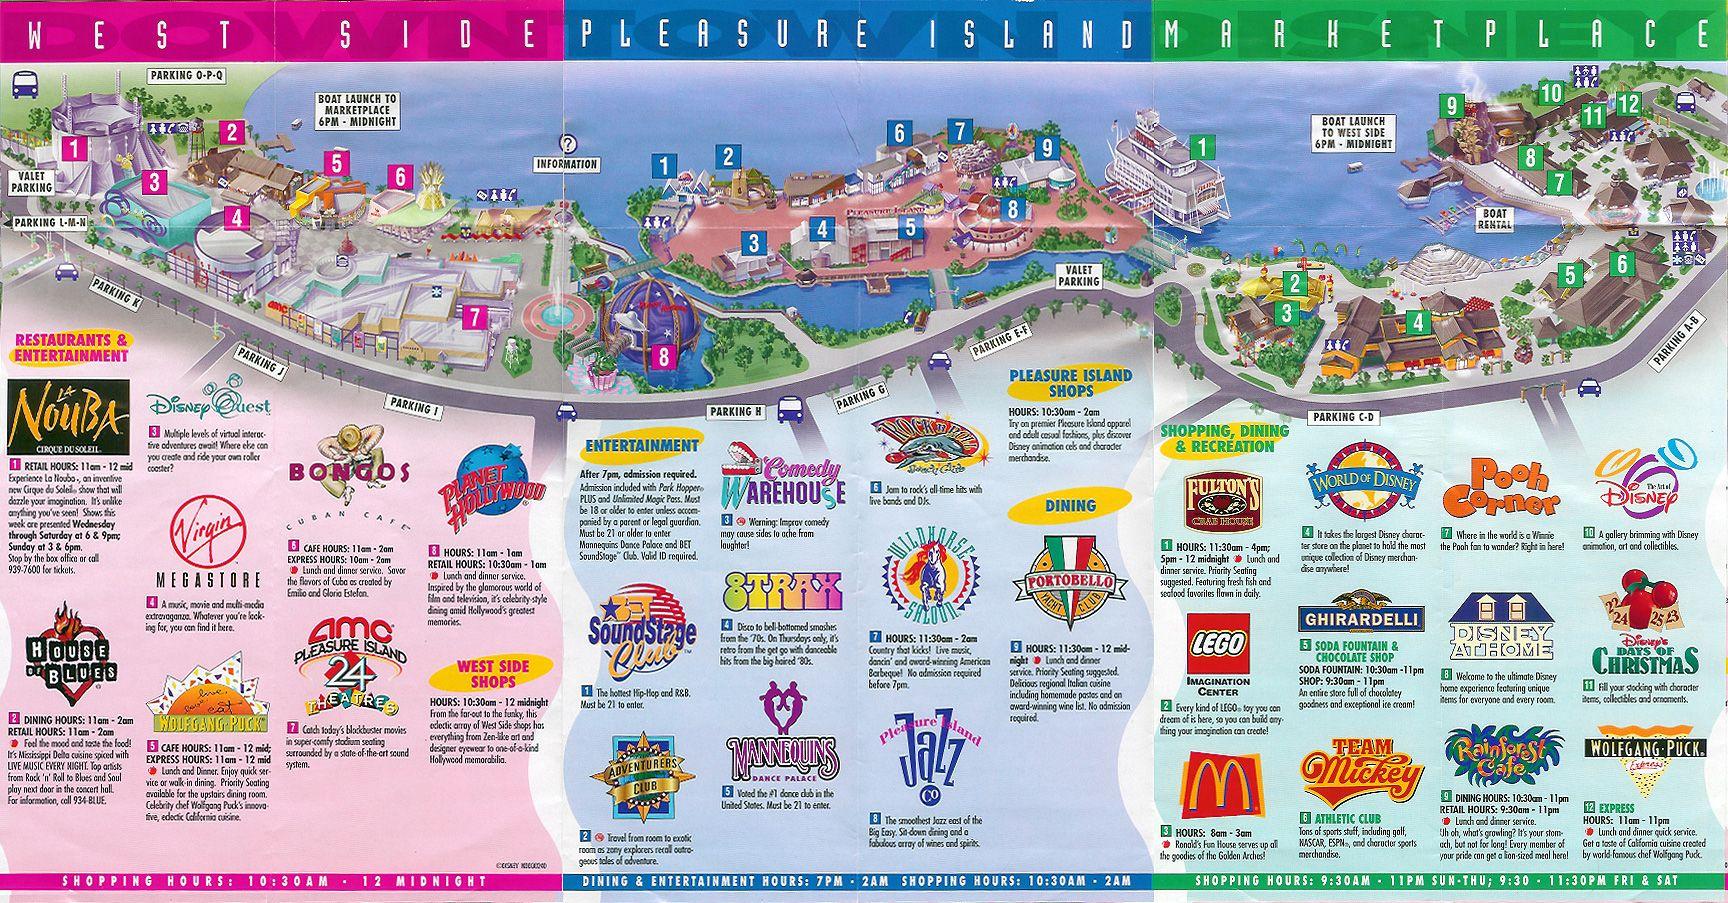 Downtown Disney Orlando | Downtown Disney - 1999 Map | Travel - Map Of Downtown Disney Orlando Florida